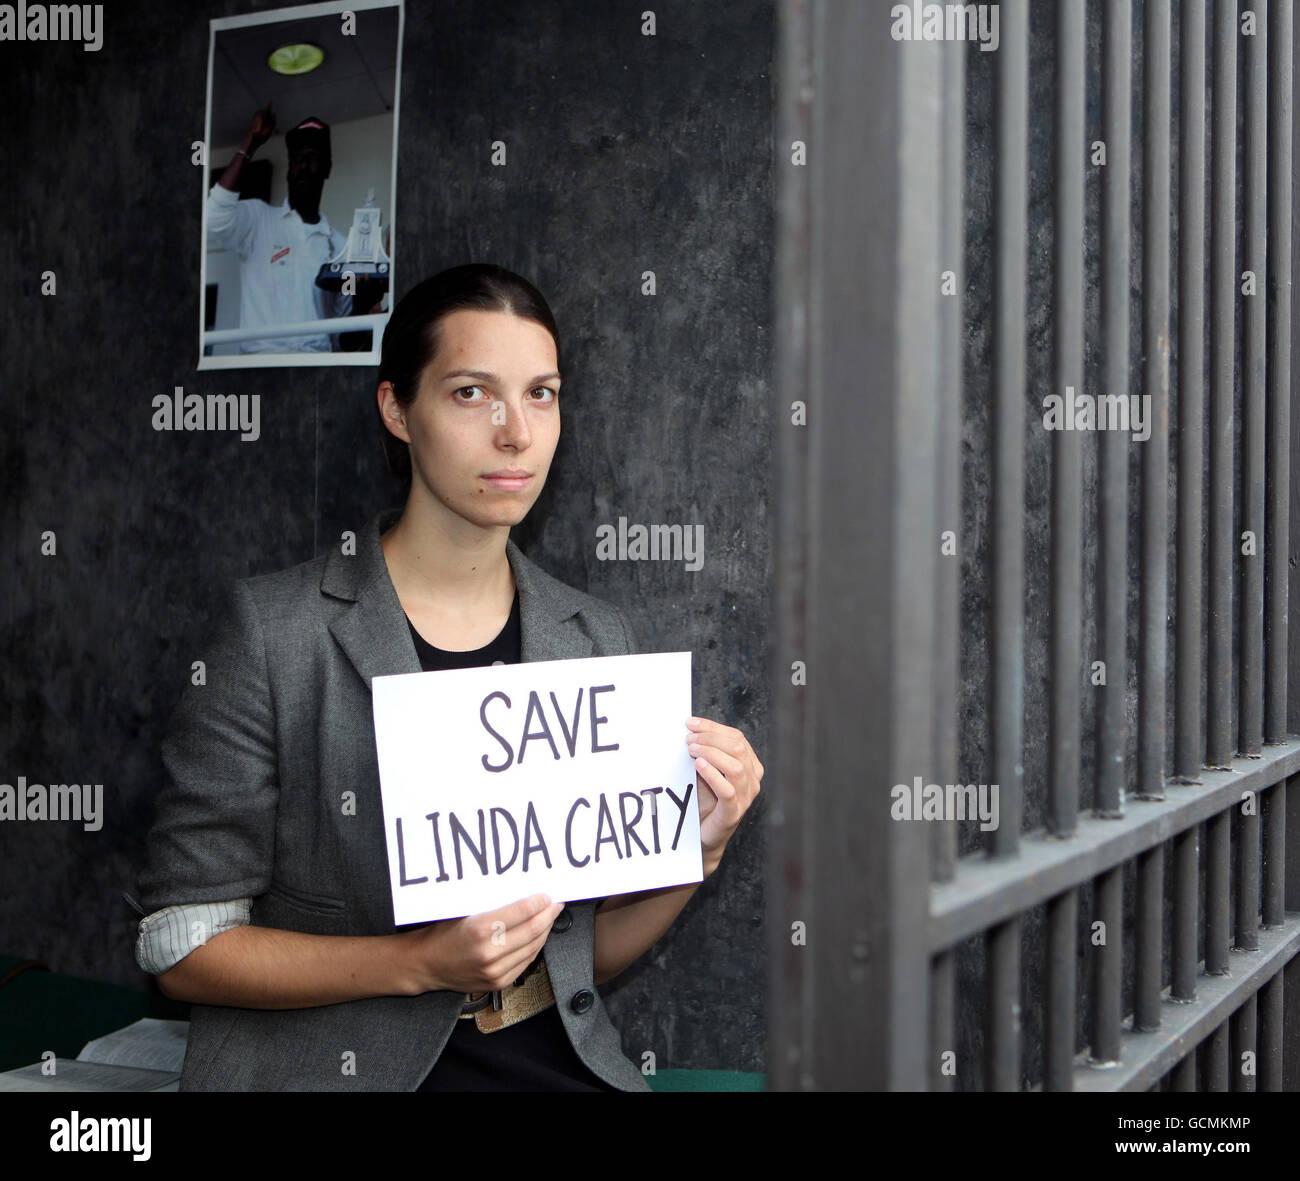 Linda Carty Stock Photo